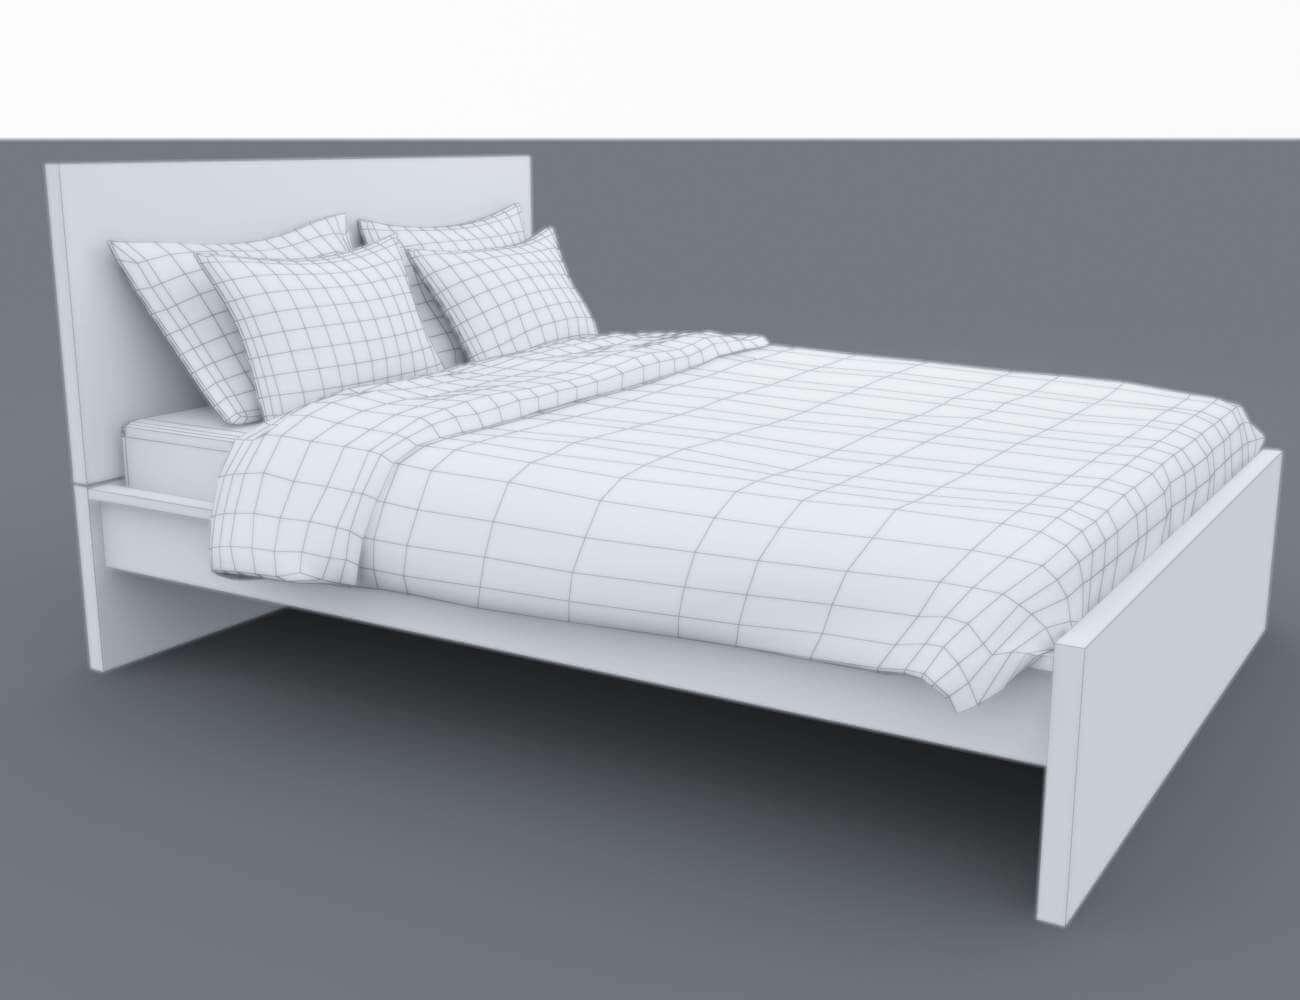 Ikea Malm Bed 3D Model